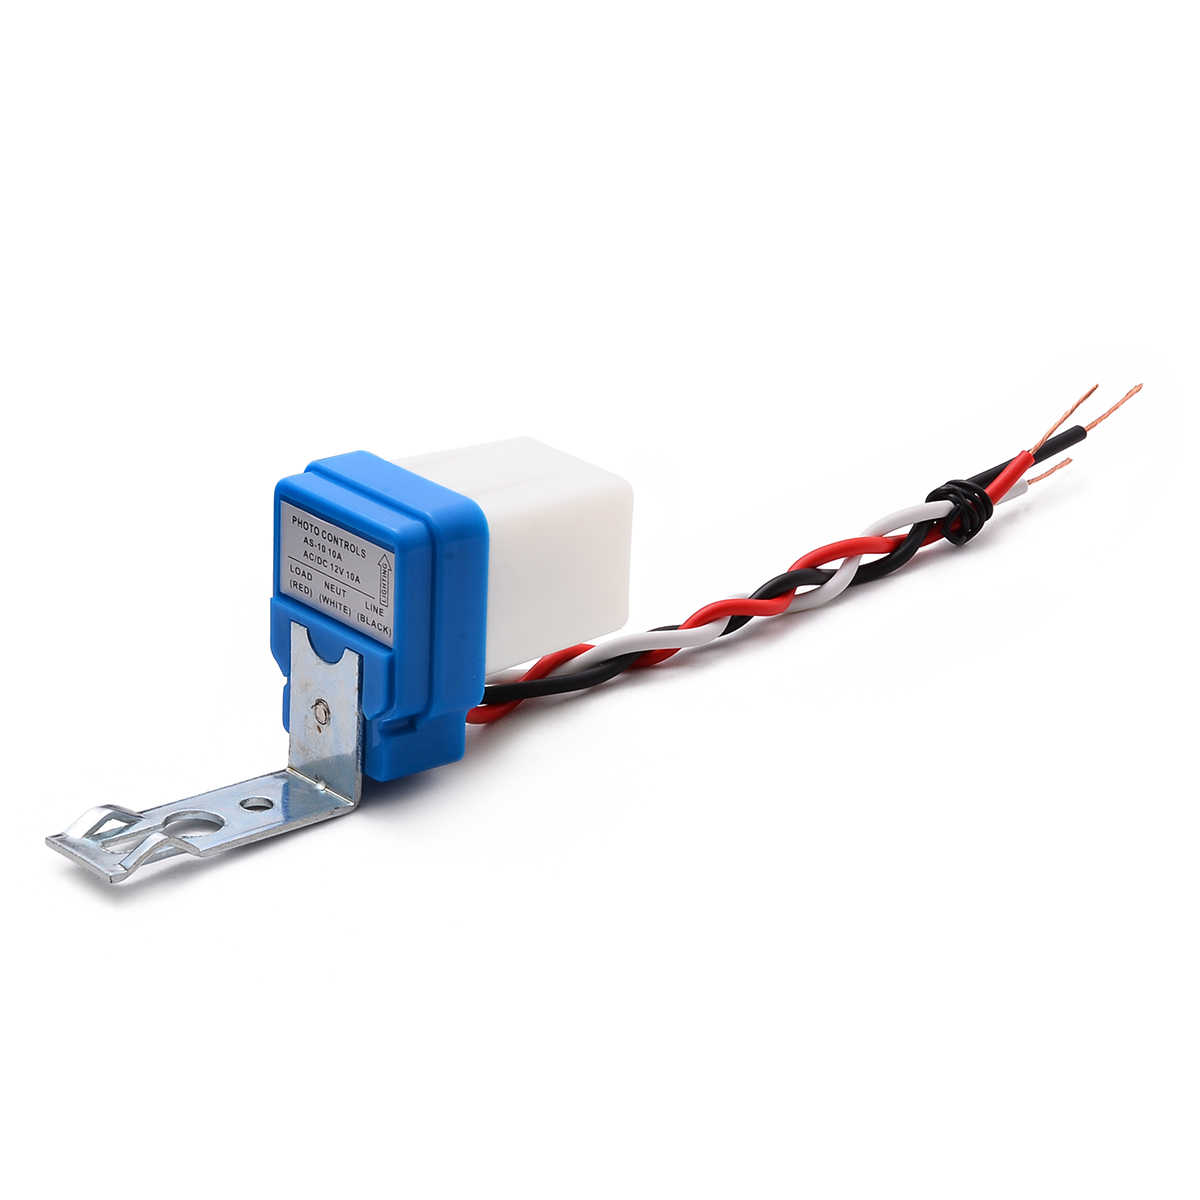 Automatic Night On Day Off Street Light Switch Photo Controls Sensor 12V 10A/_#